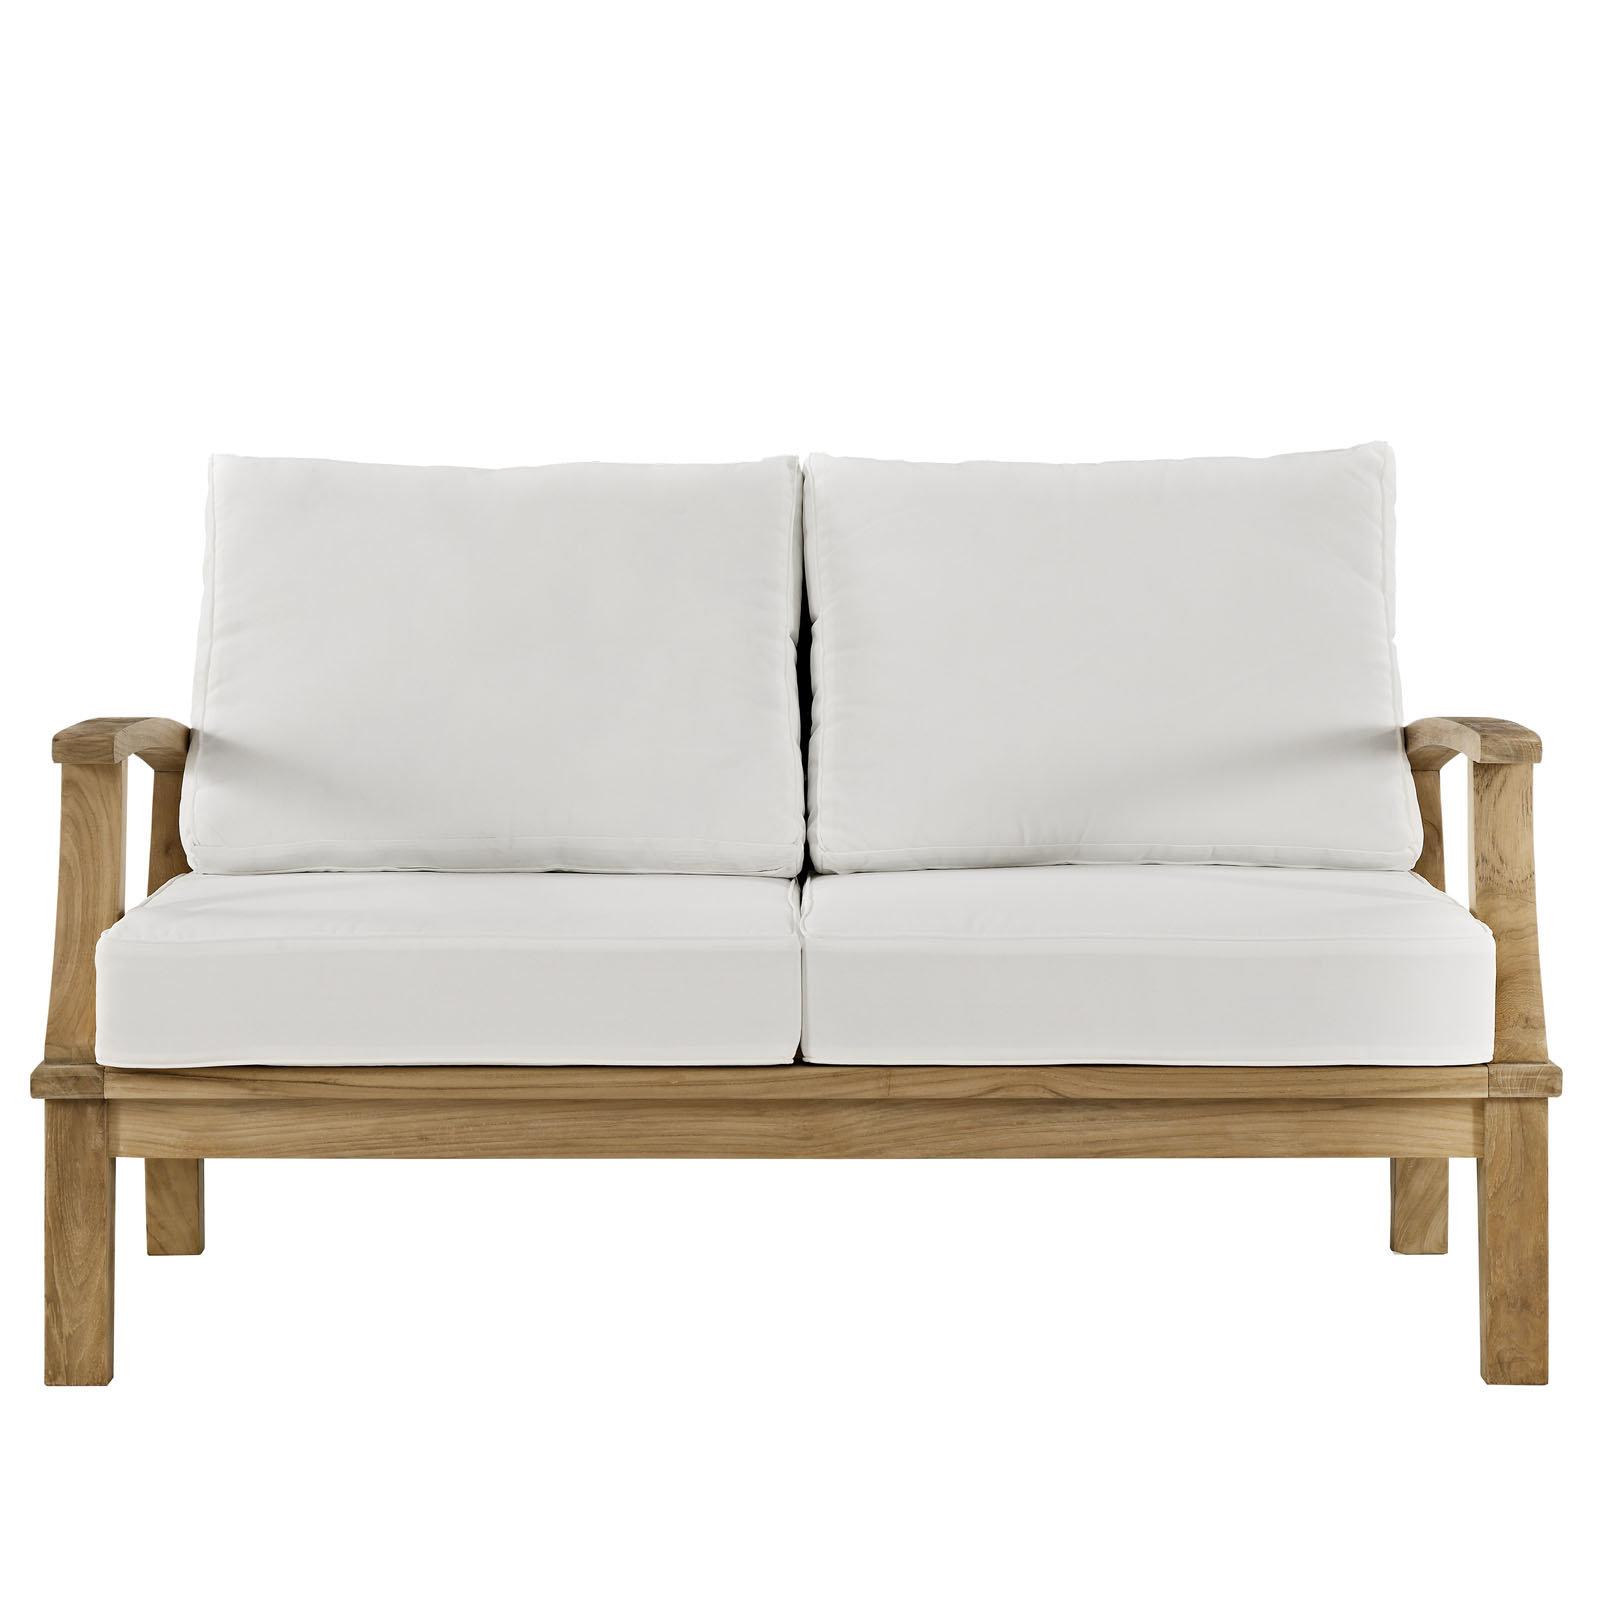 Favorite Elaina Teak Loveseats With Cushions Within Elaina Teak Loveseat With Cushions (View 11 of 20)